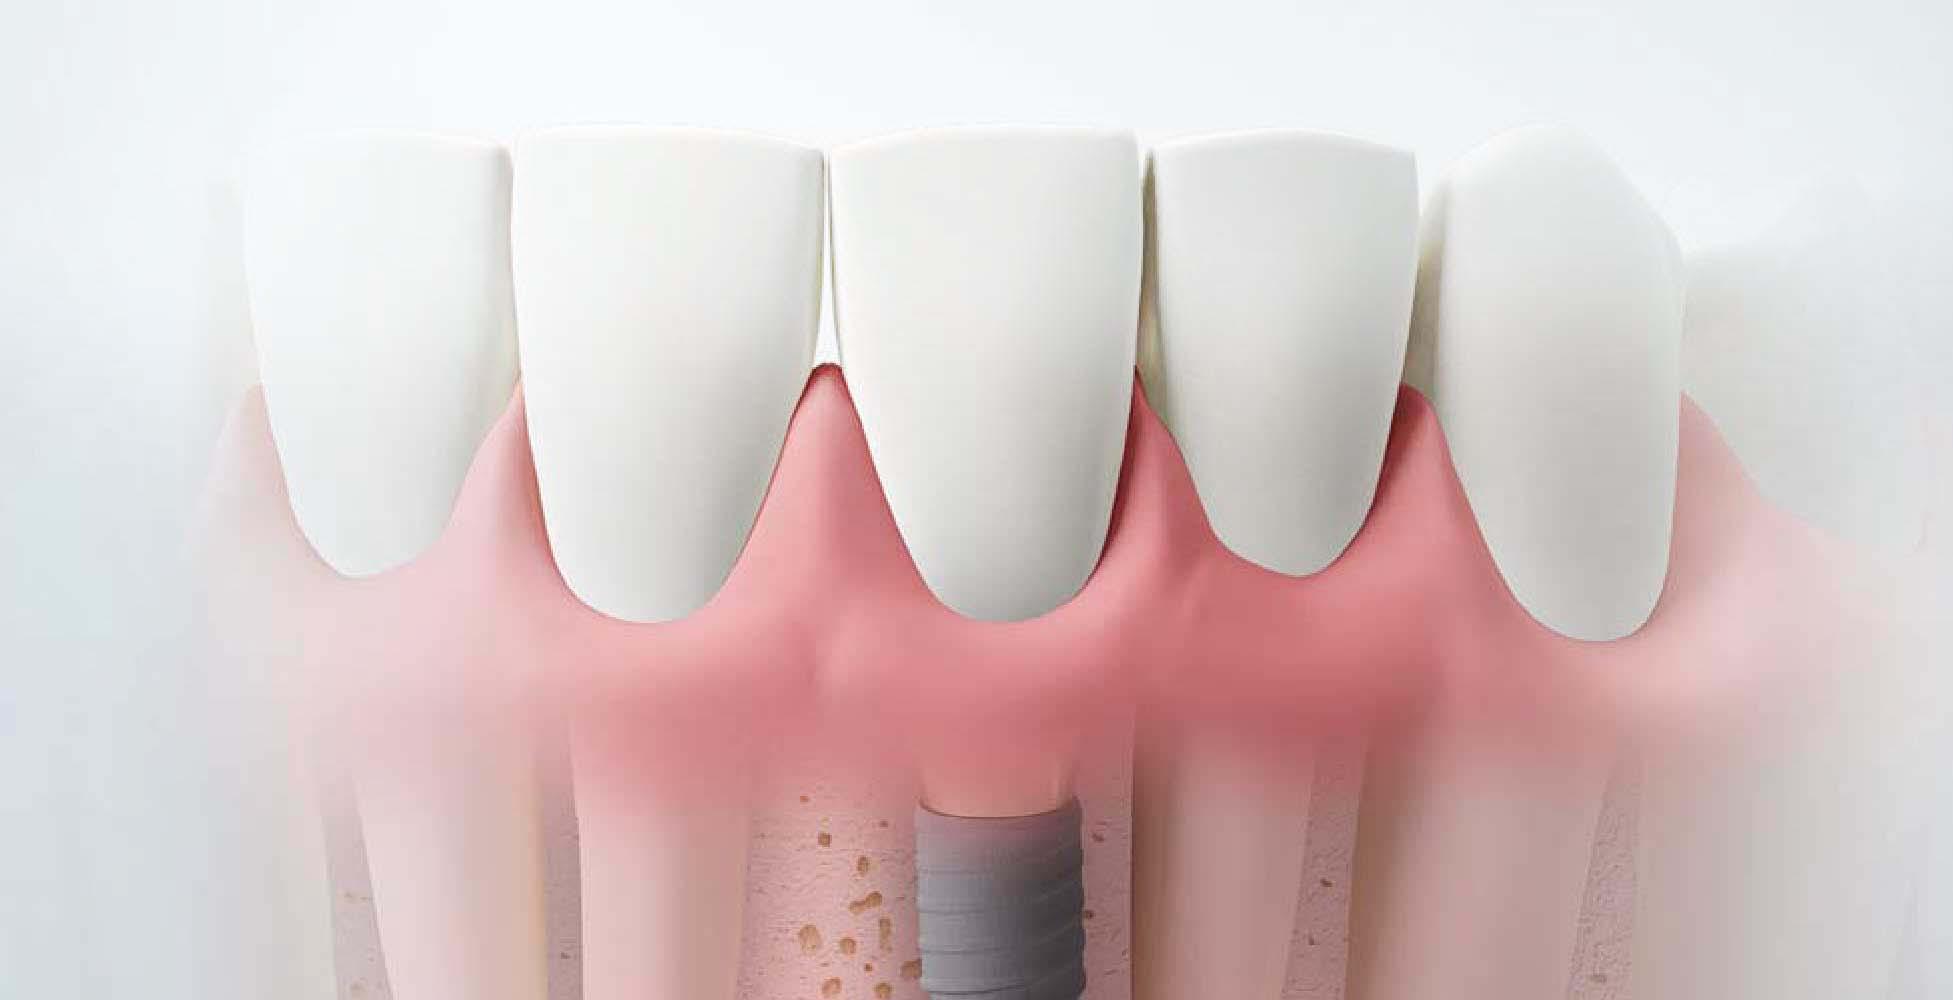 dental implants Upland CA